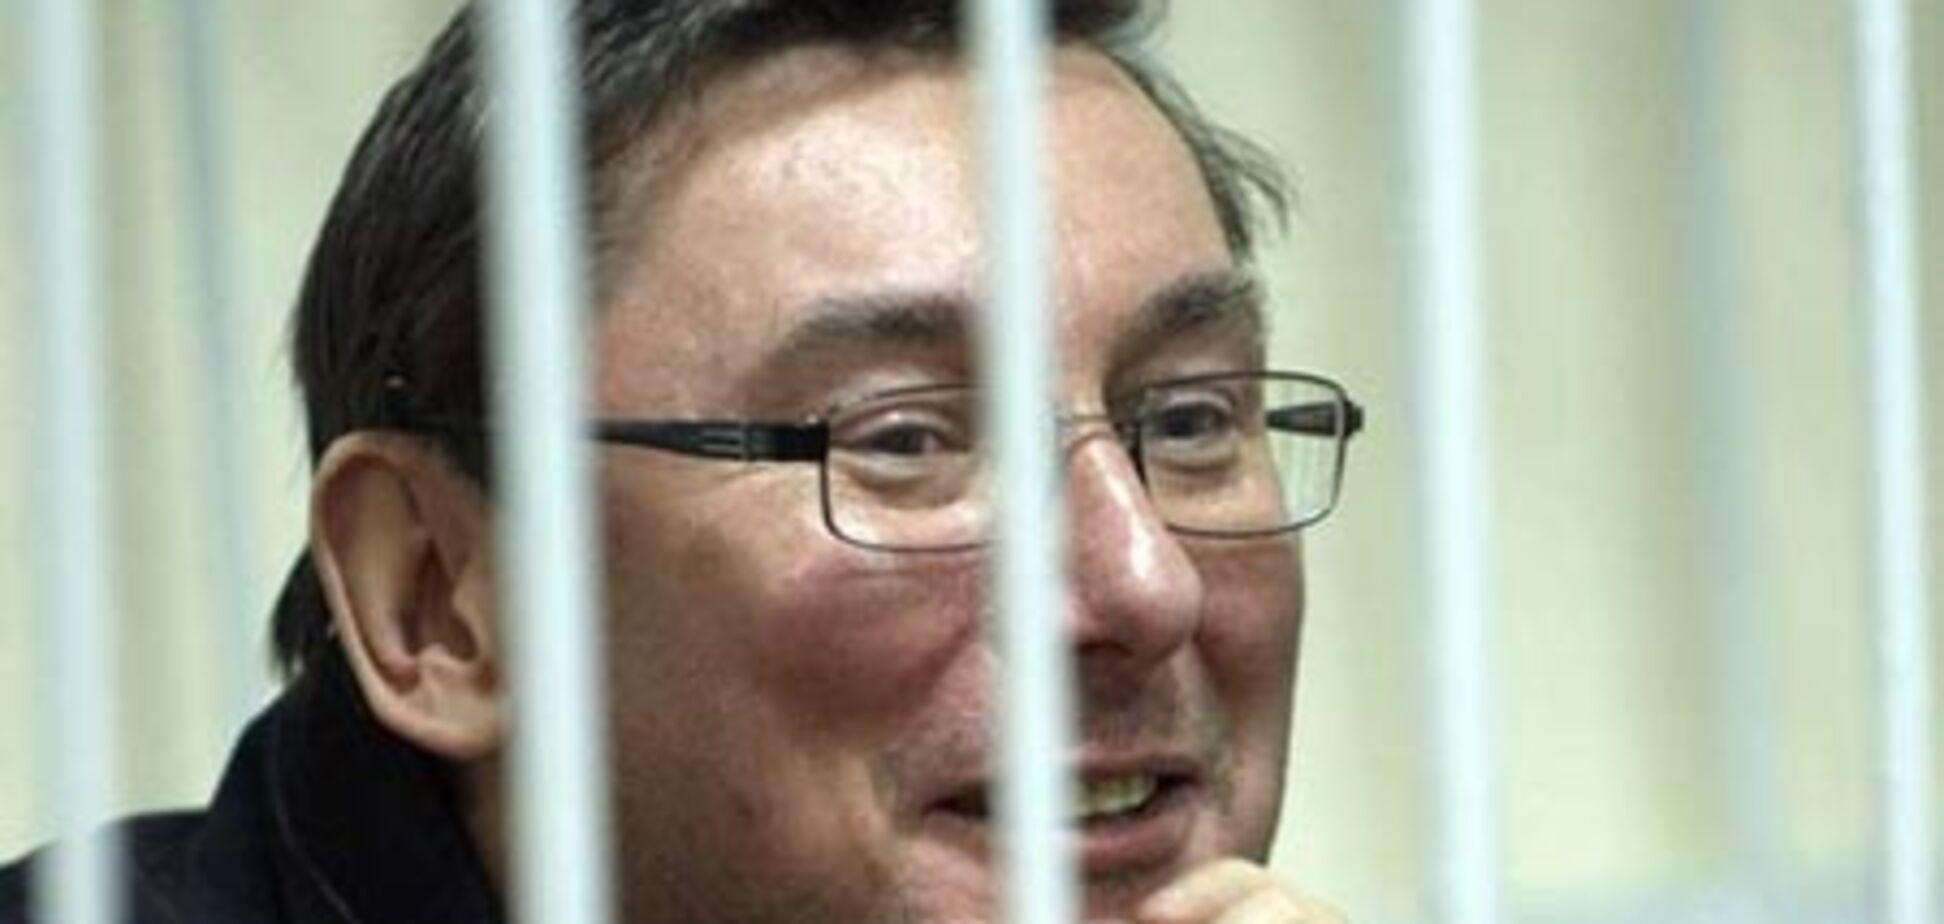 Украинские политики в СИЗО: даже за решеткой - VIPы